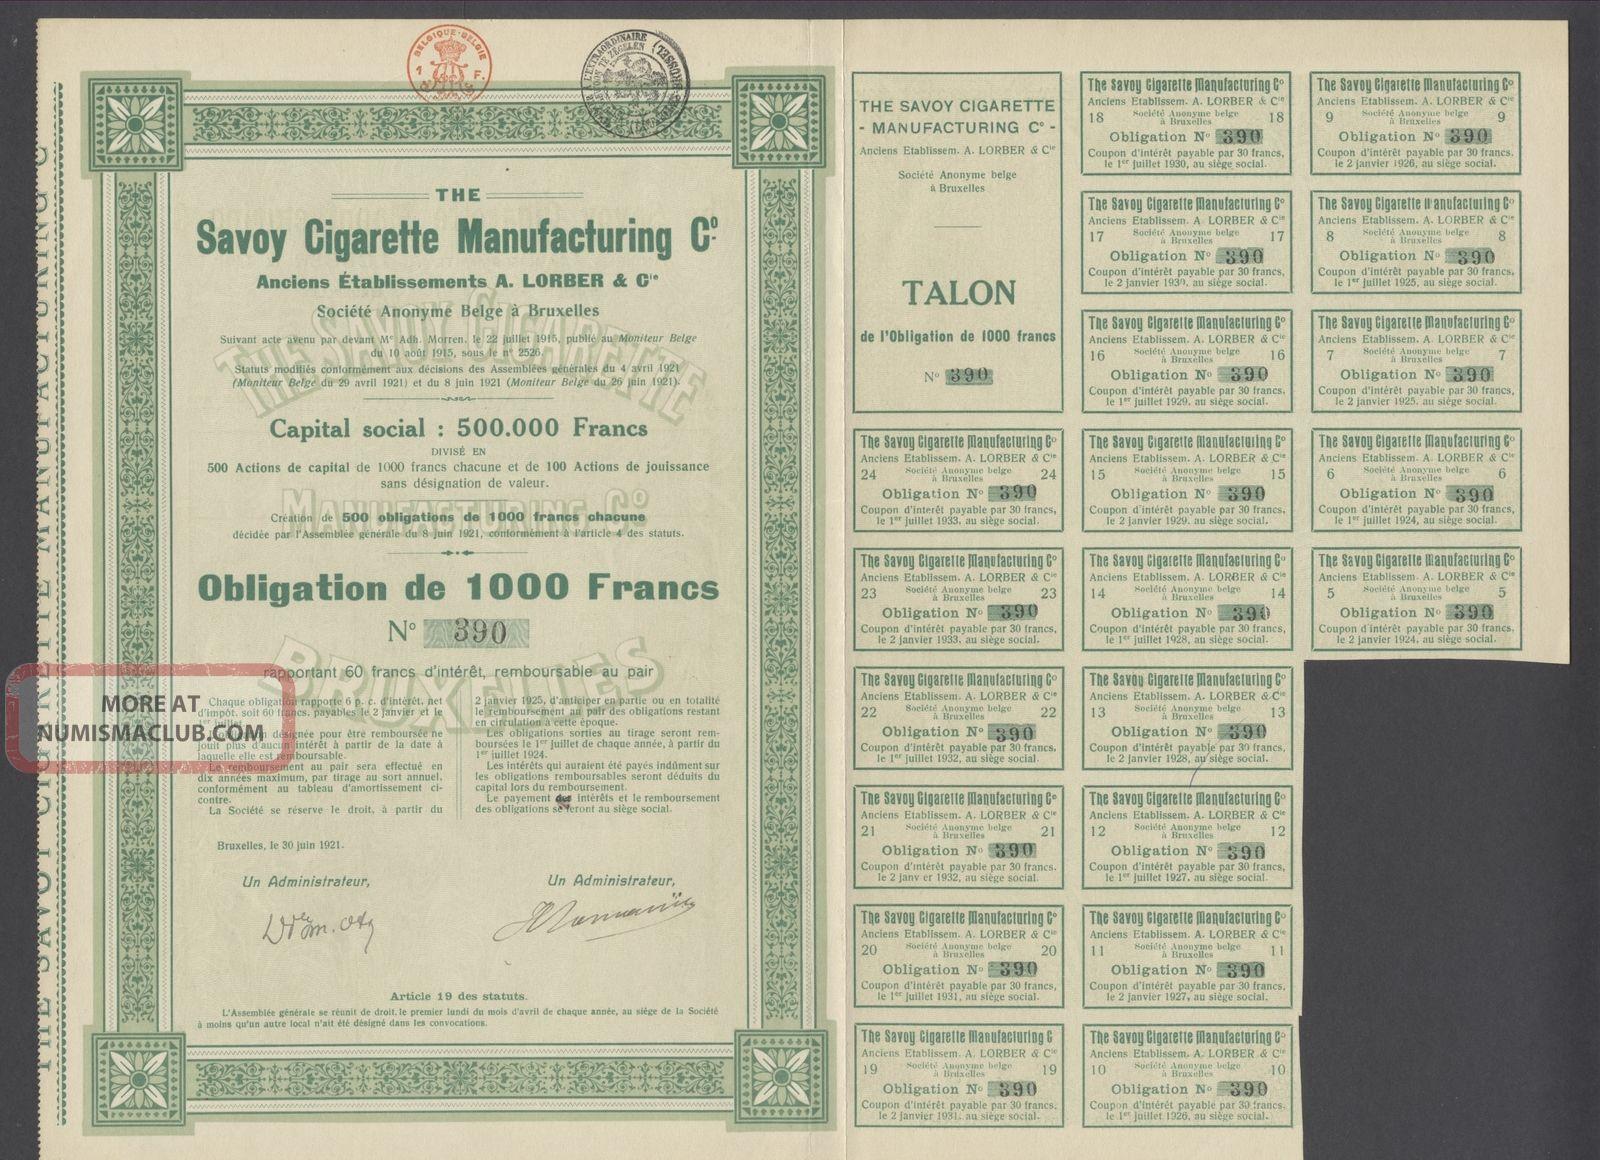 Belgium 1921 Bond - Savoy Cigarette Manufacturing - Tabac Tobacco. .  R3379 World photo